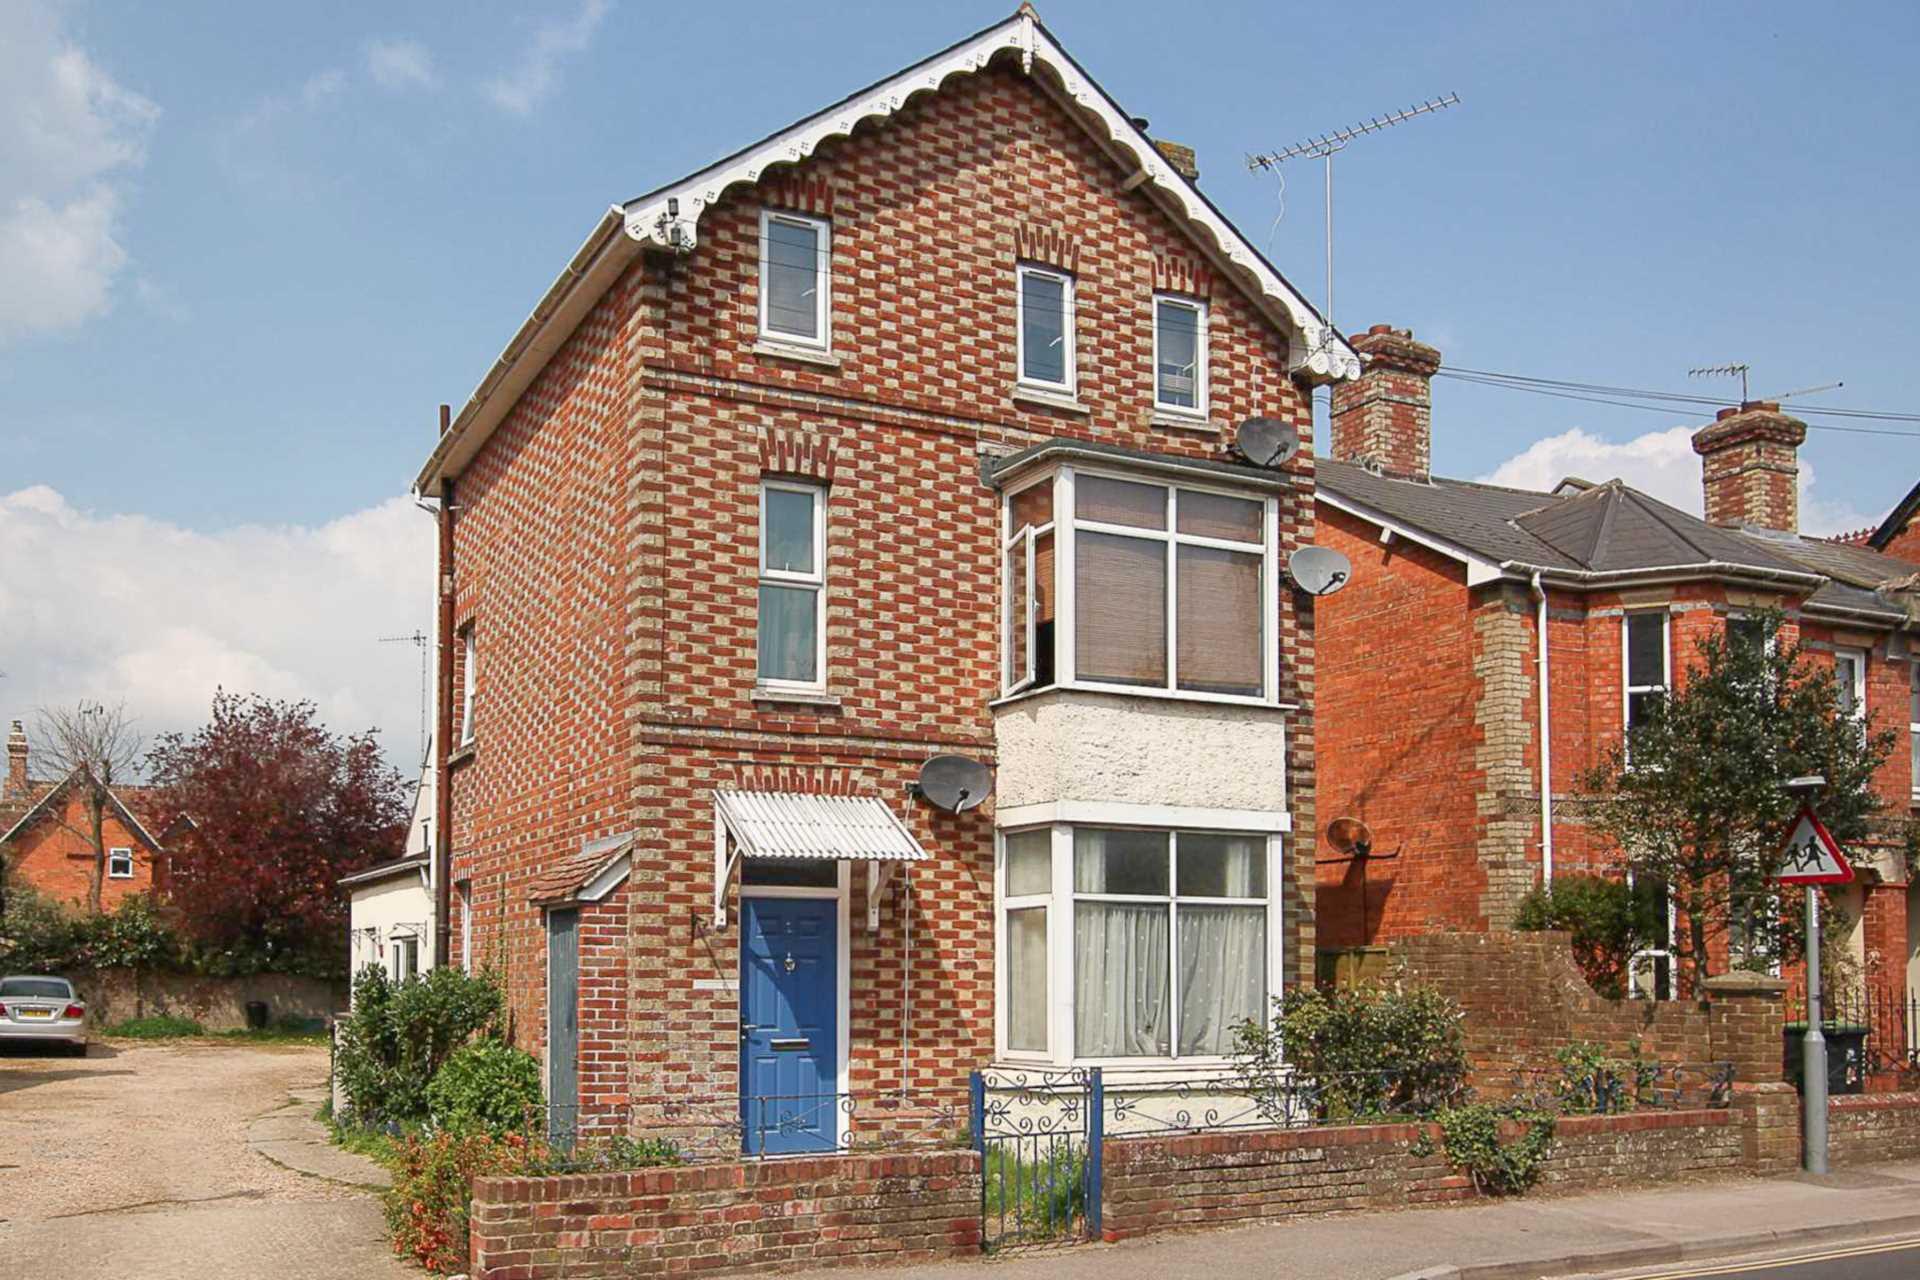 2 bed flat for sale in Salisbury Road, Blandford Forum, Blandford Forum 0